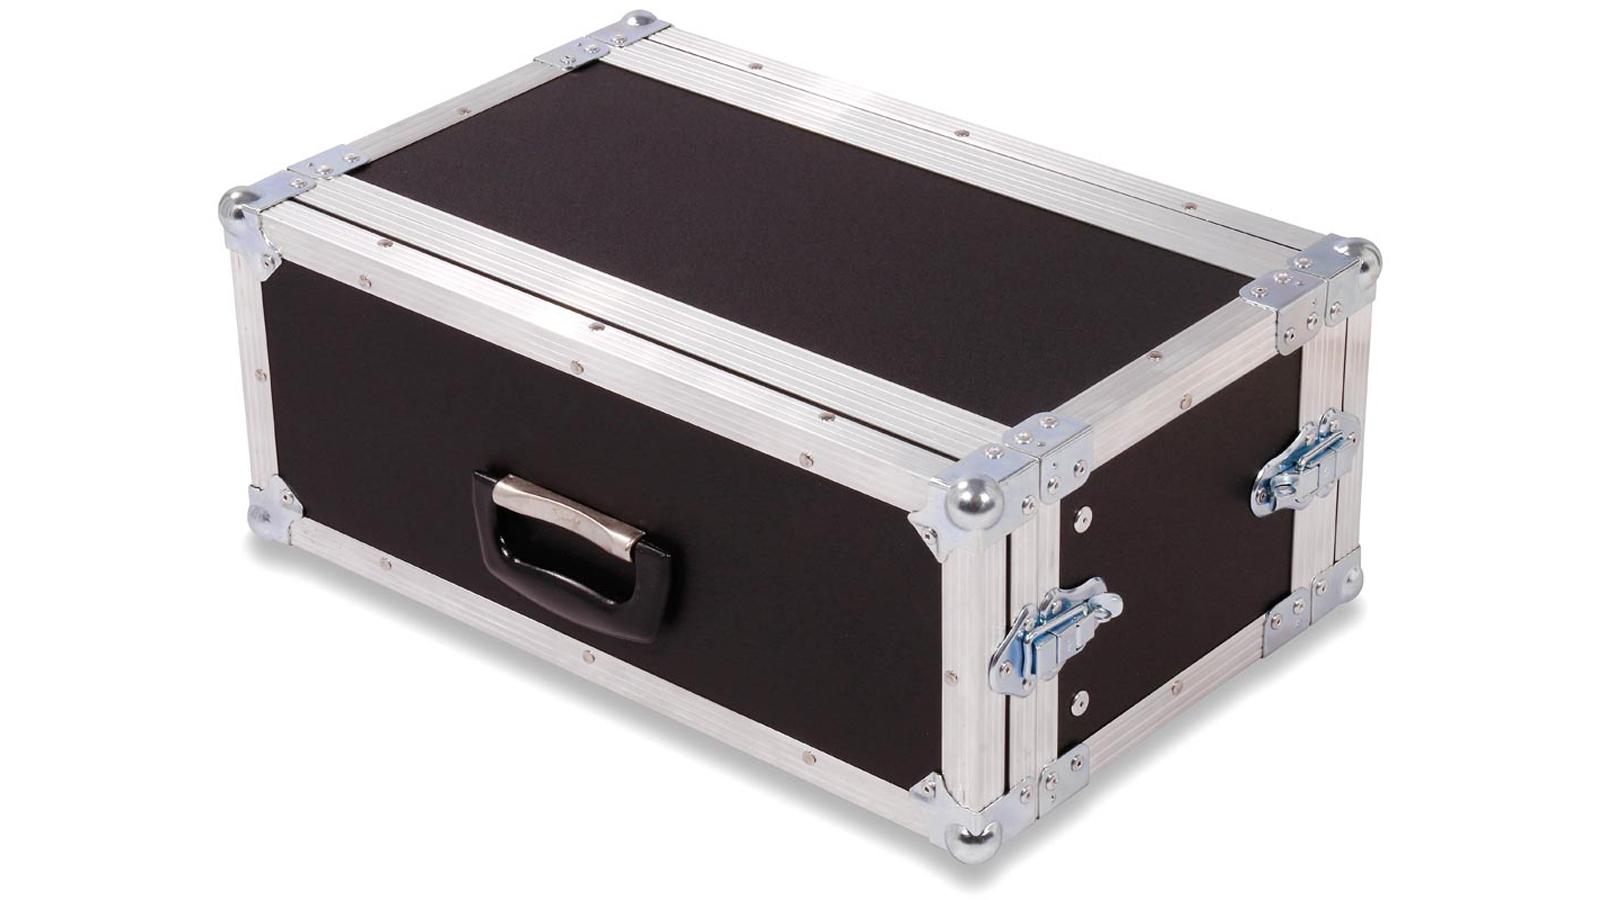 LT Case 4 HE ECO II compact Rack 23 cm phenol 7644